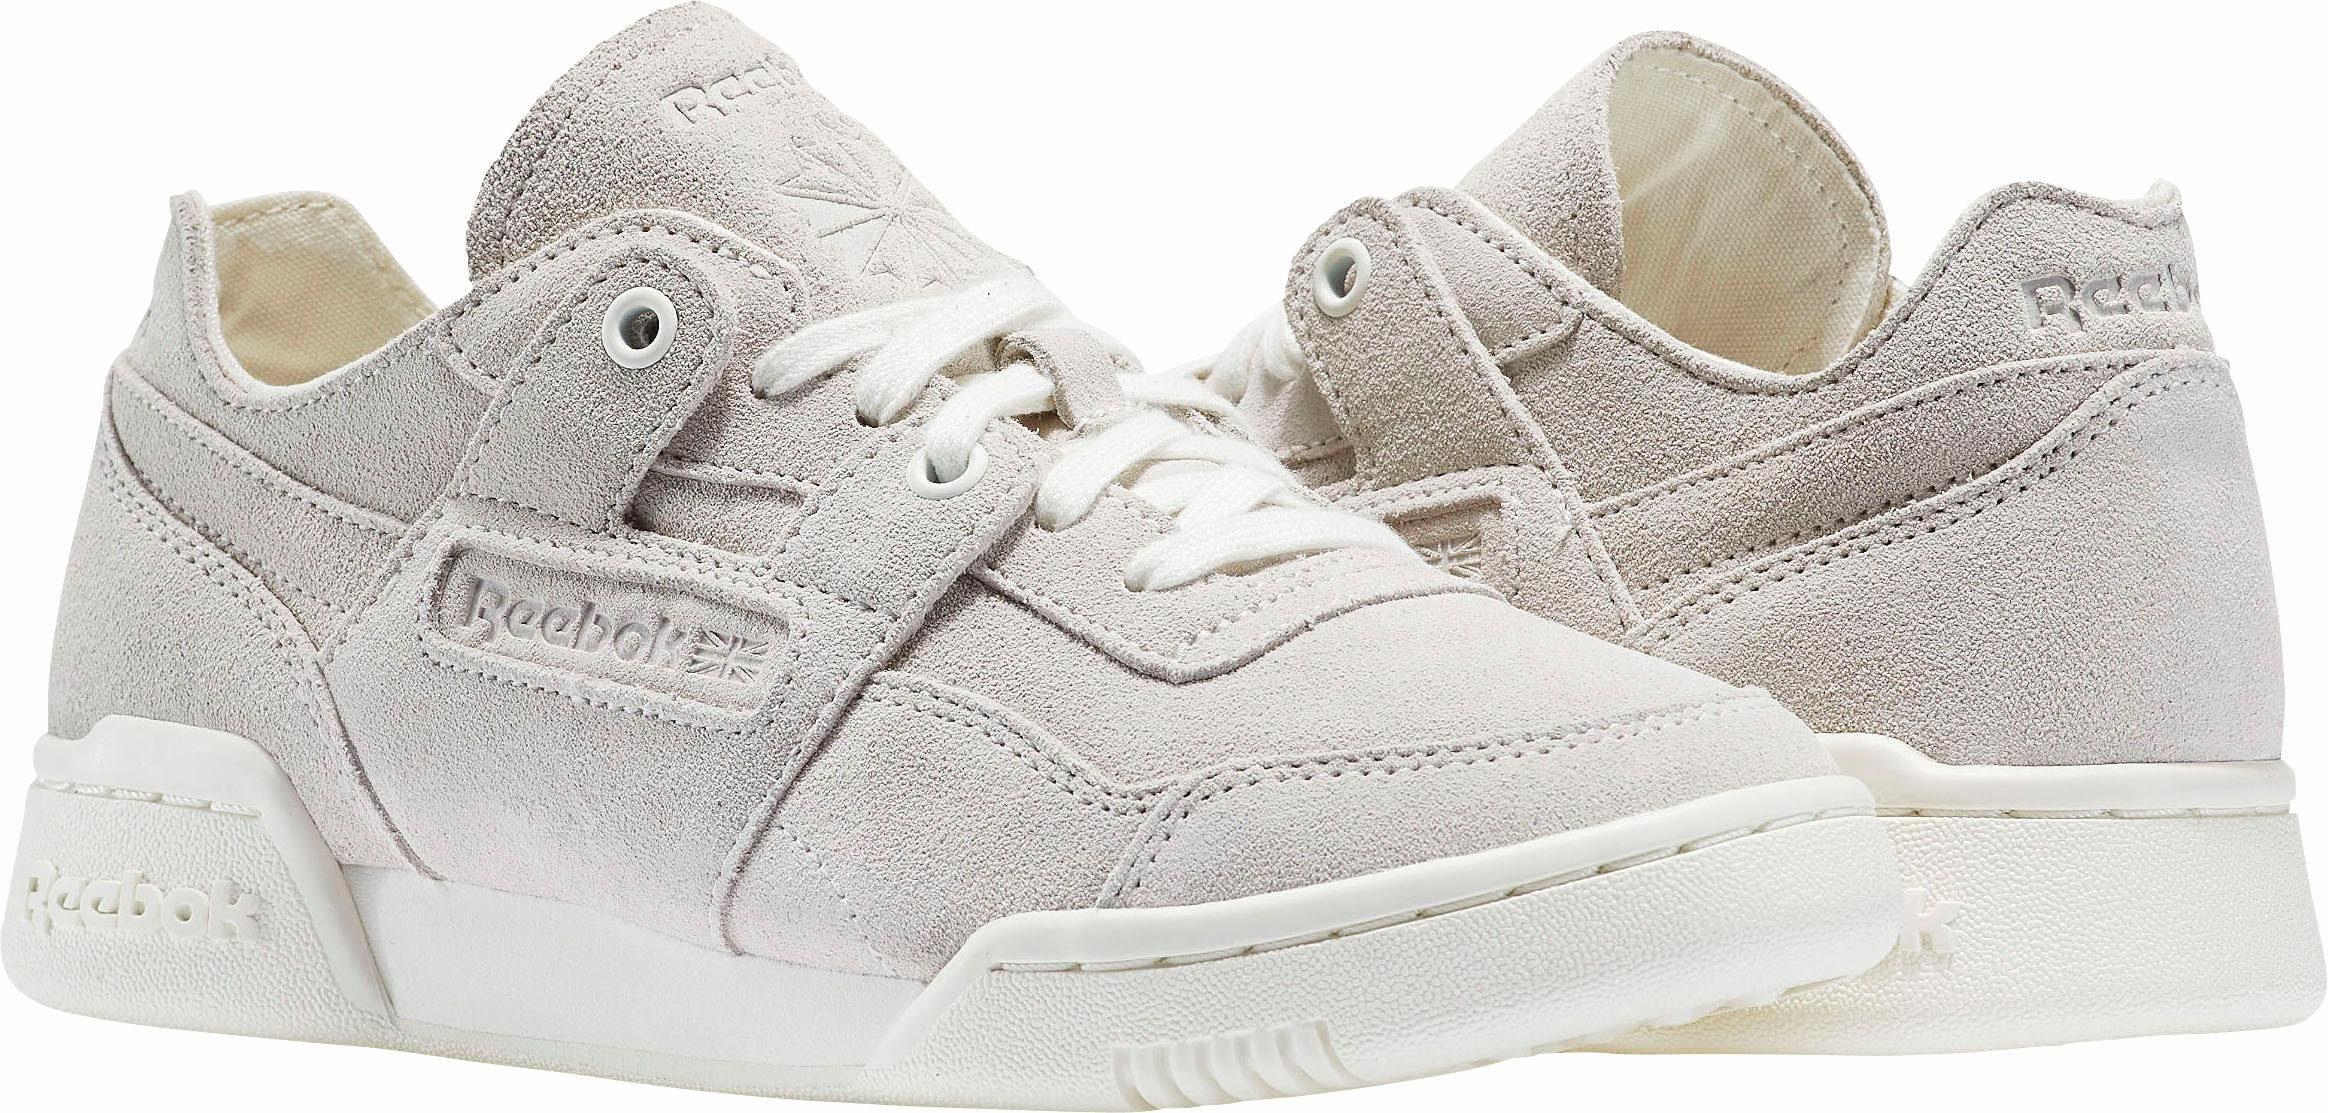 Miroitement En Cuir Roebuck Cl W Chaussures Sneakers Lo Gris 4SccHz